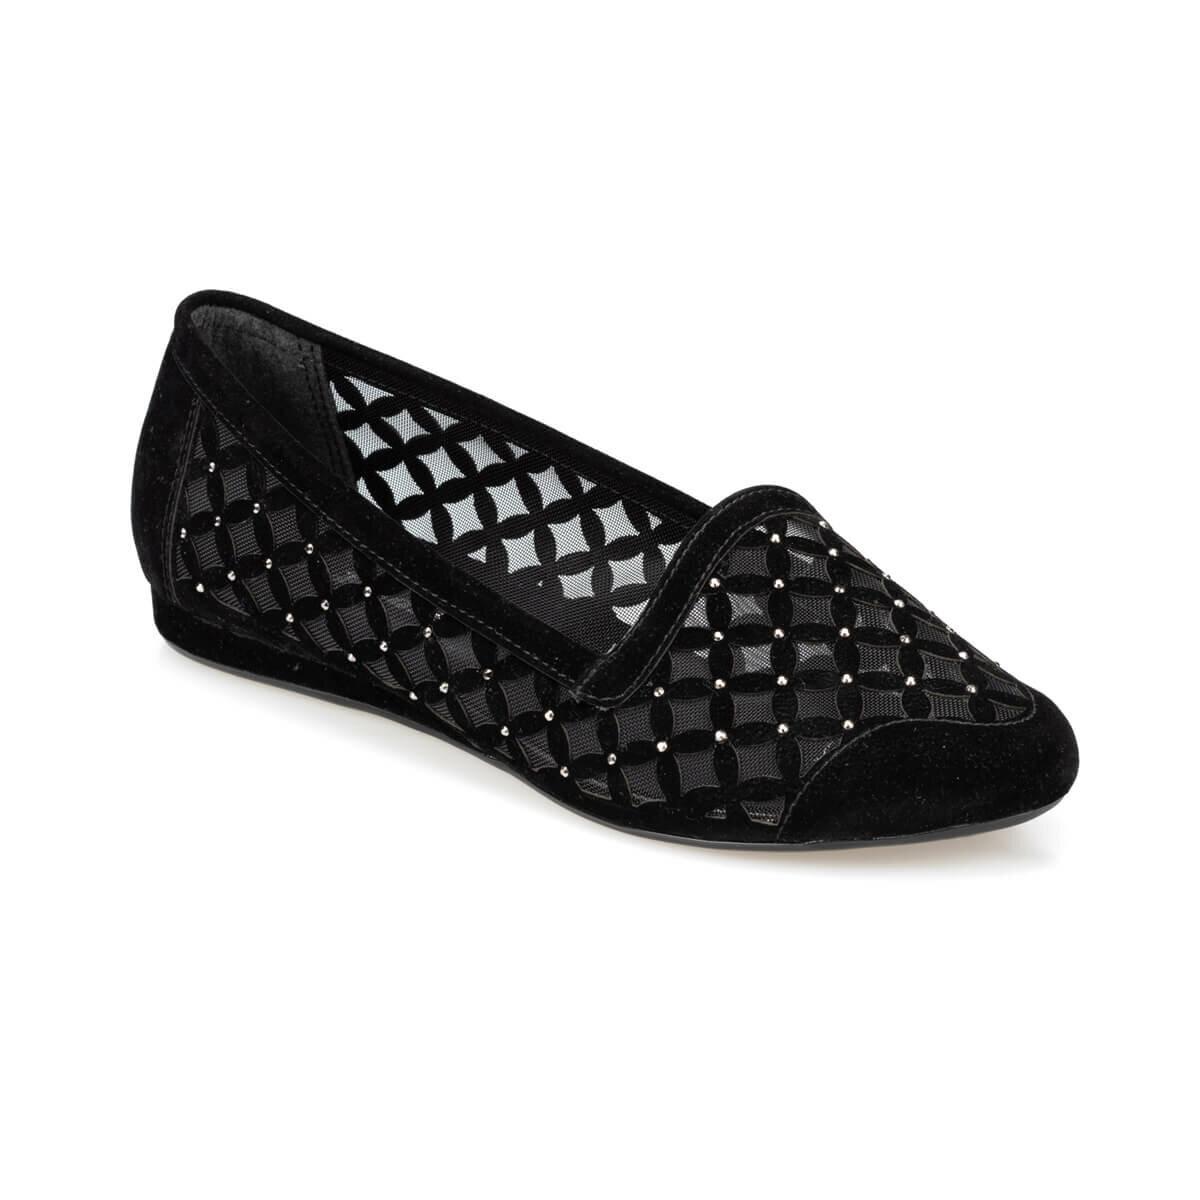 FLO 91.309733SZ Black Women Loafer Shoes Polaris